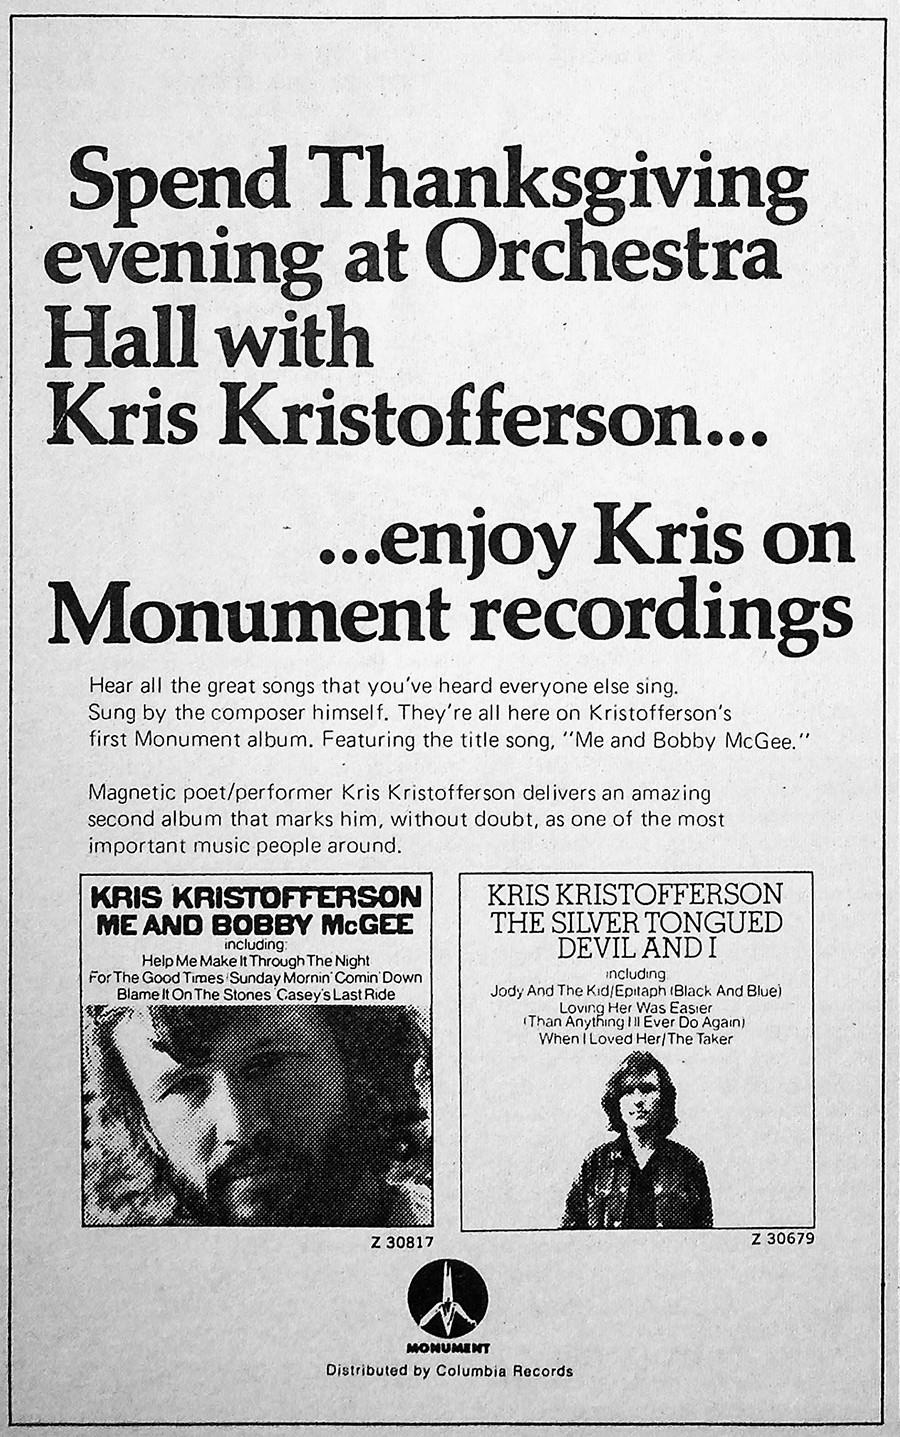 Kris Kristofferson ad from October 22, 1971